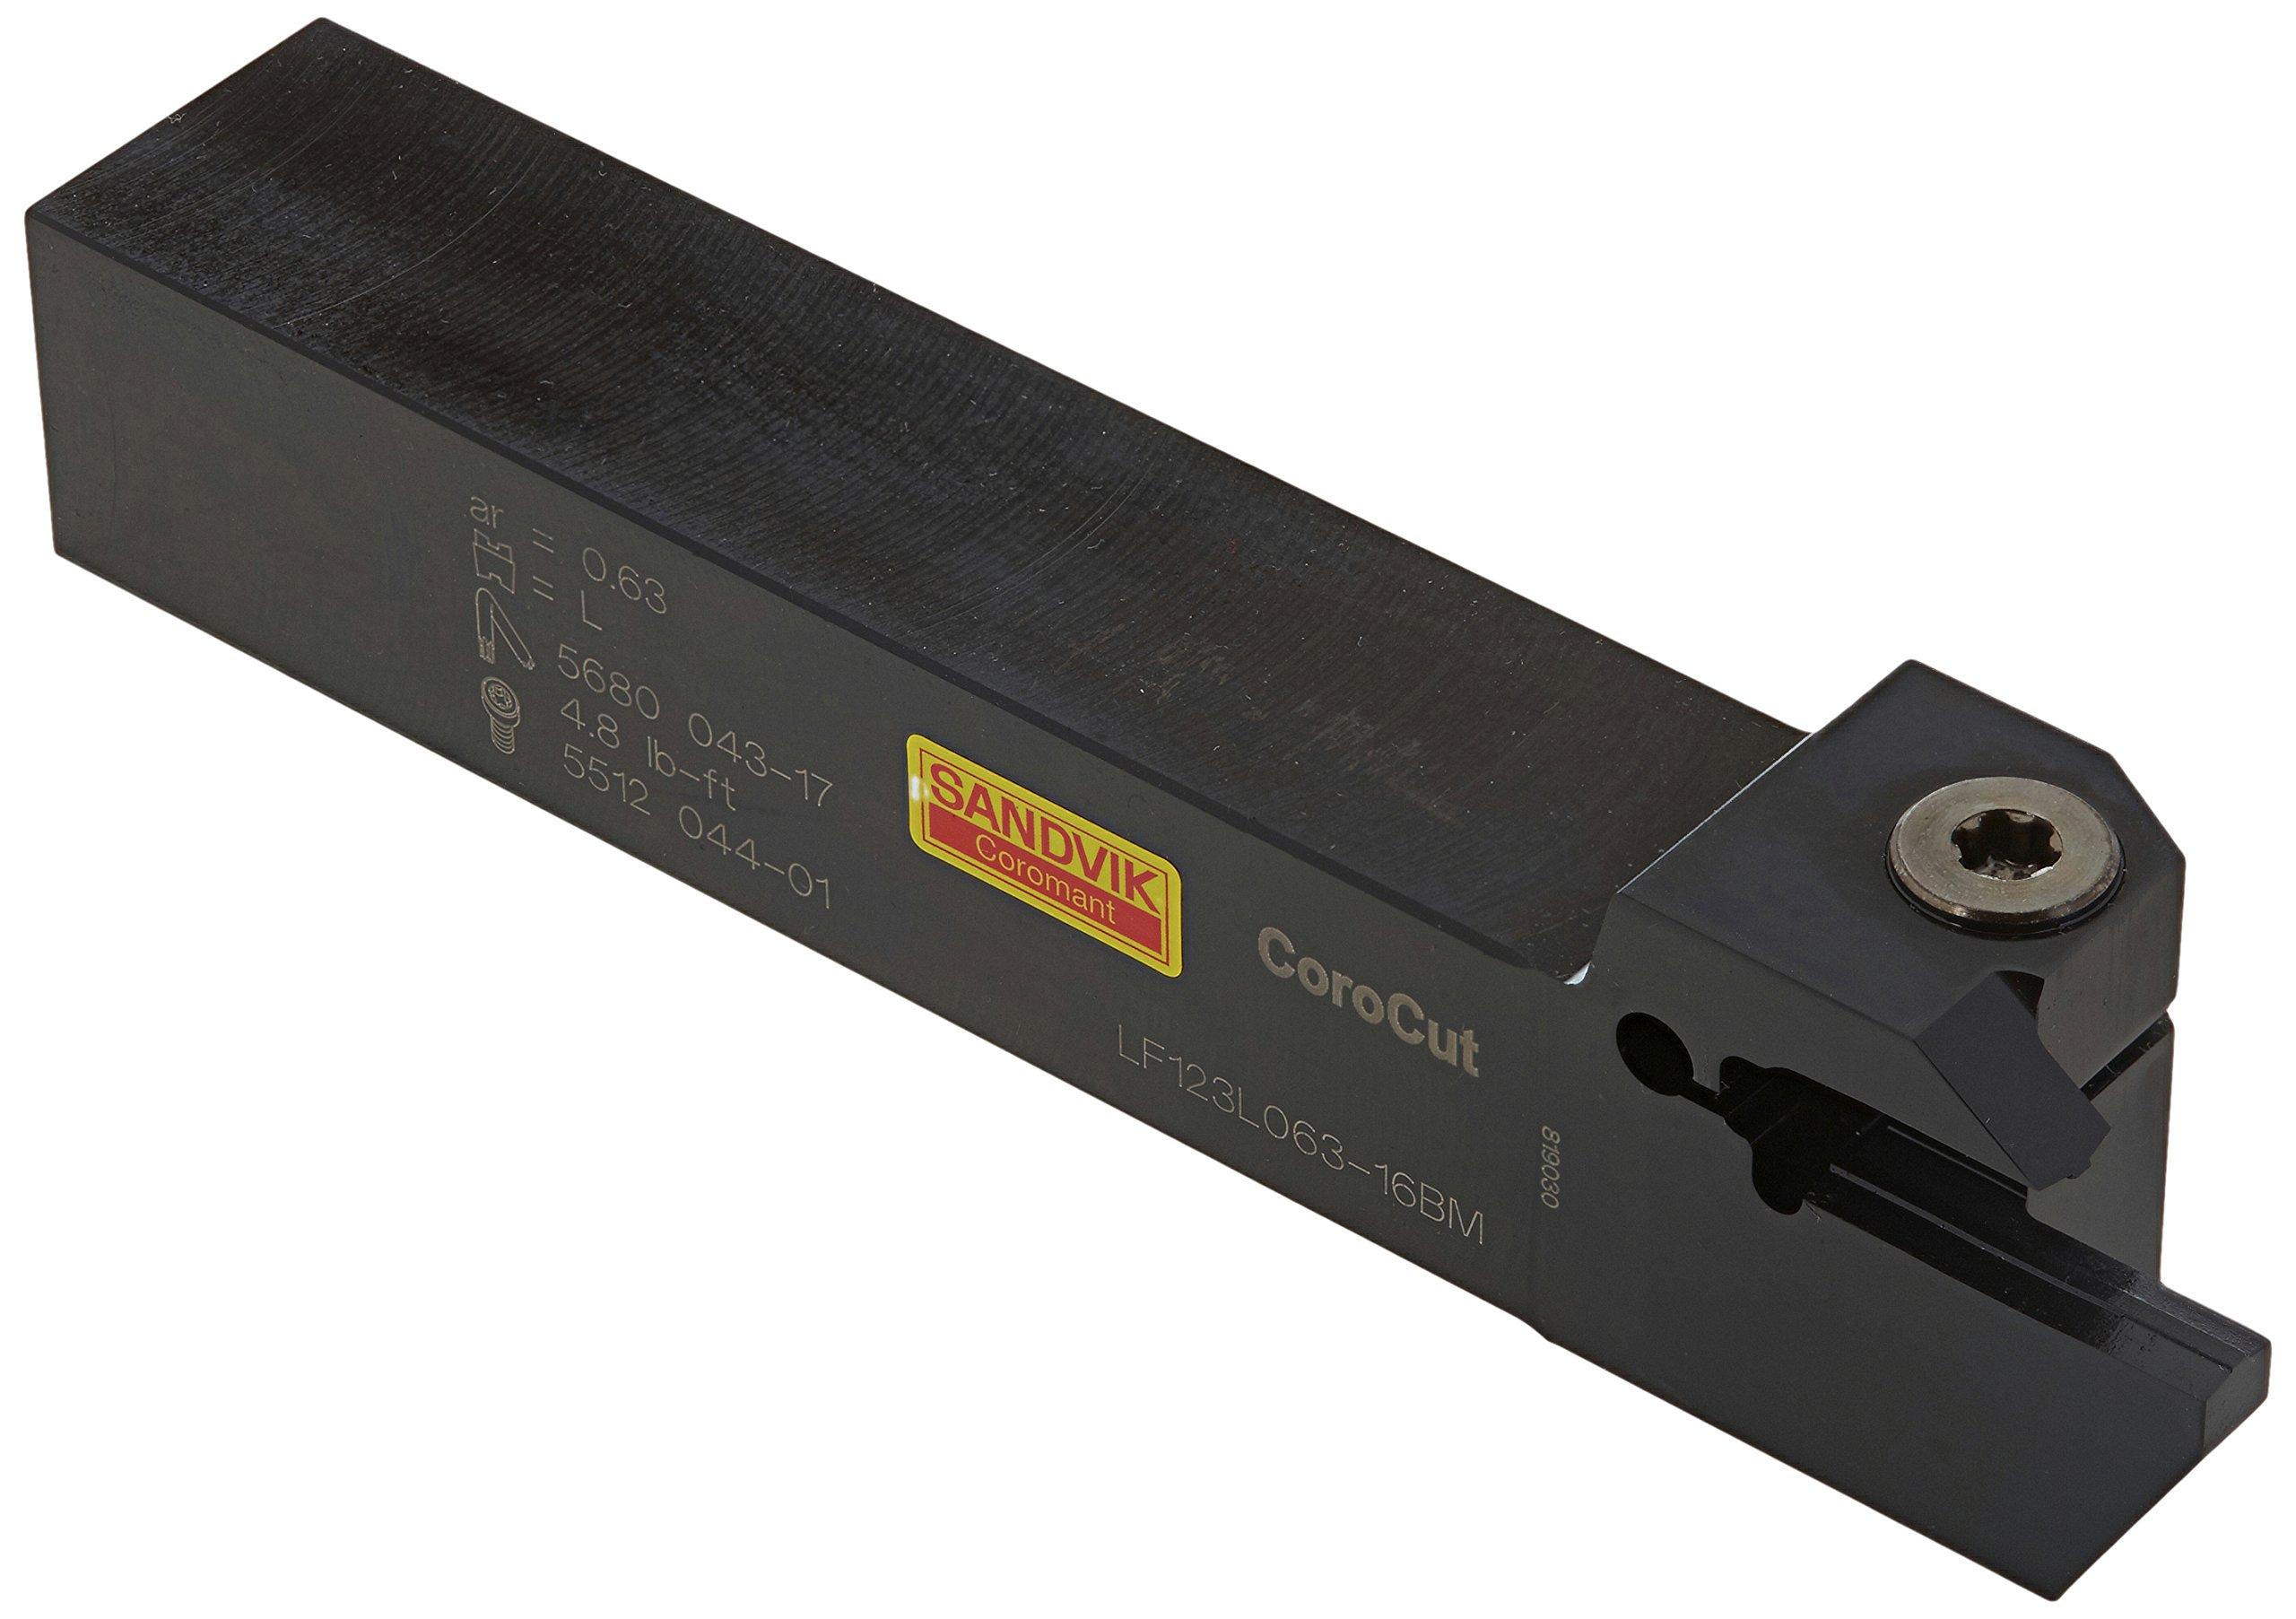 Sandvik Coromant LF123L063-16BM Steel CoroCut 1-2 Shank Tool for Parting and Grooving Holder, 0.98'' Maximum Depth of Cut